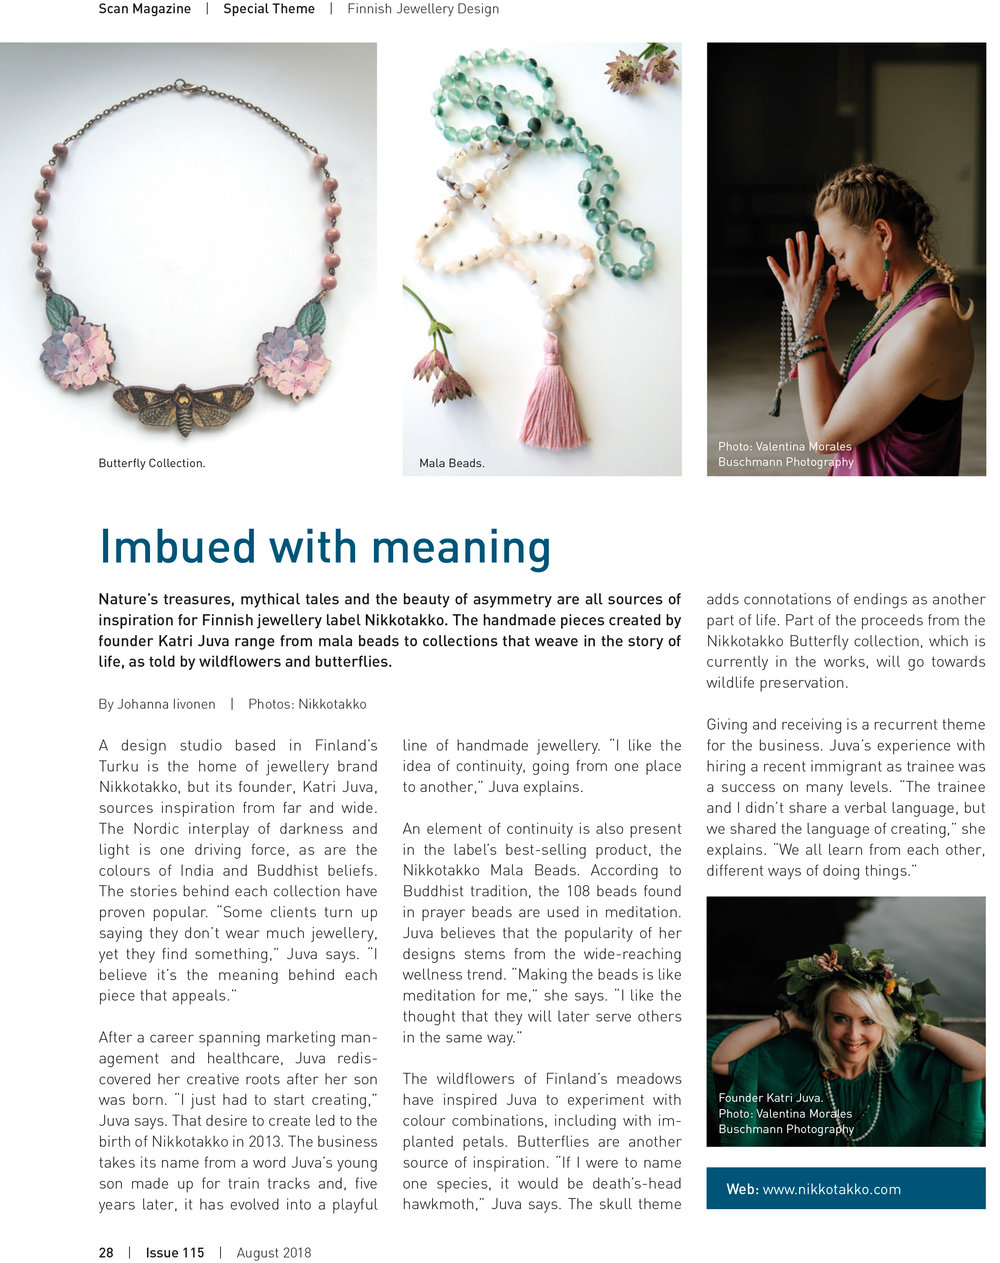 Nikkotakko Jewelry Scan Magazine Finnish Jewelry Design.jpg